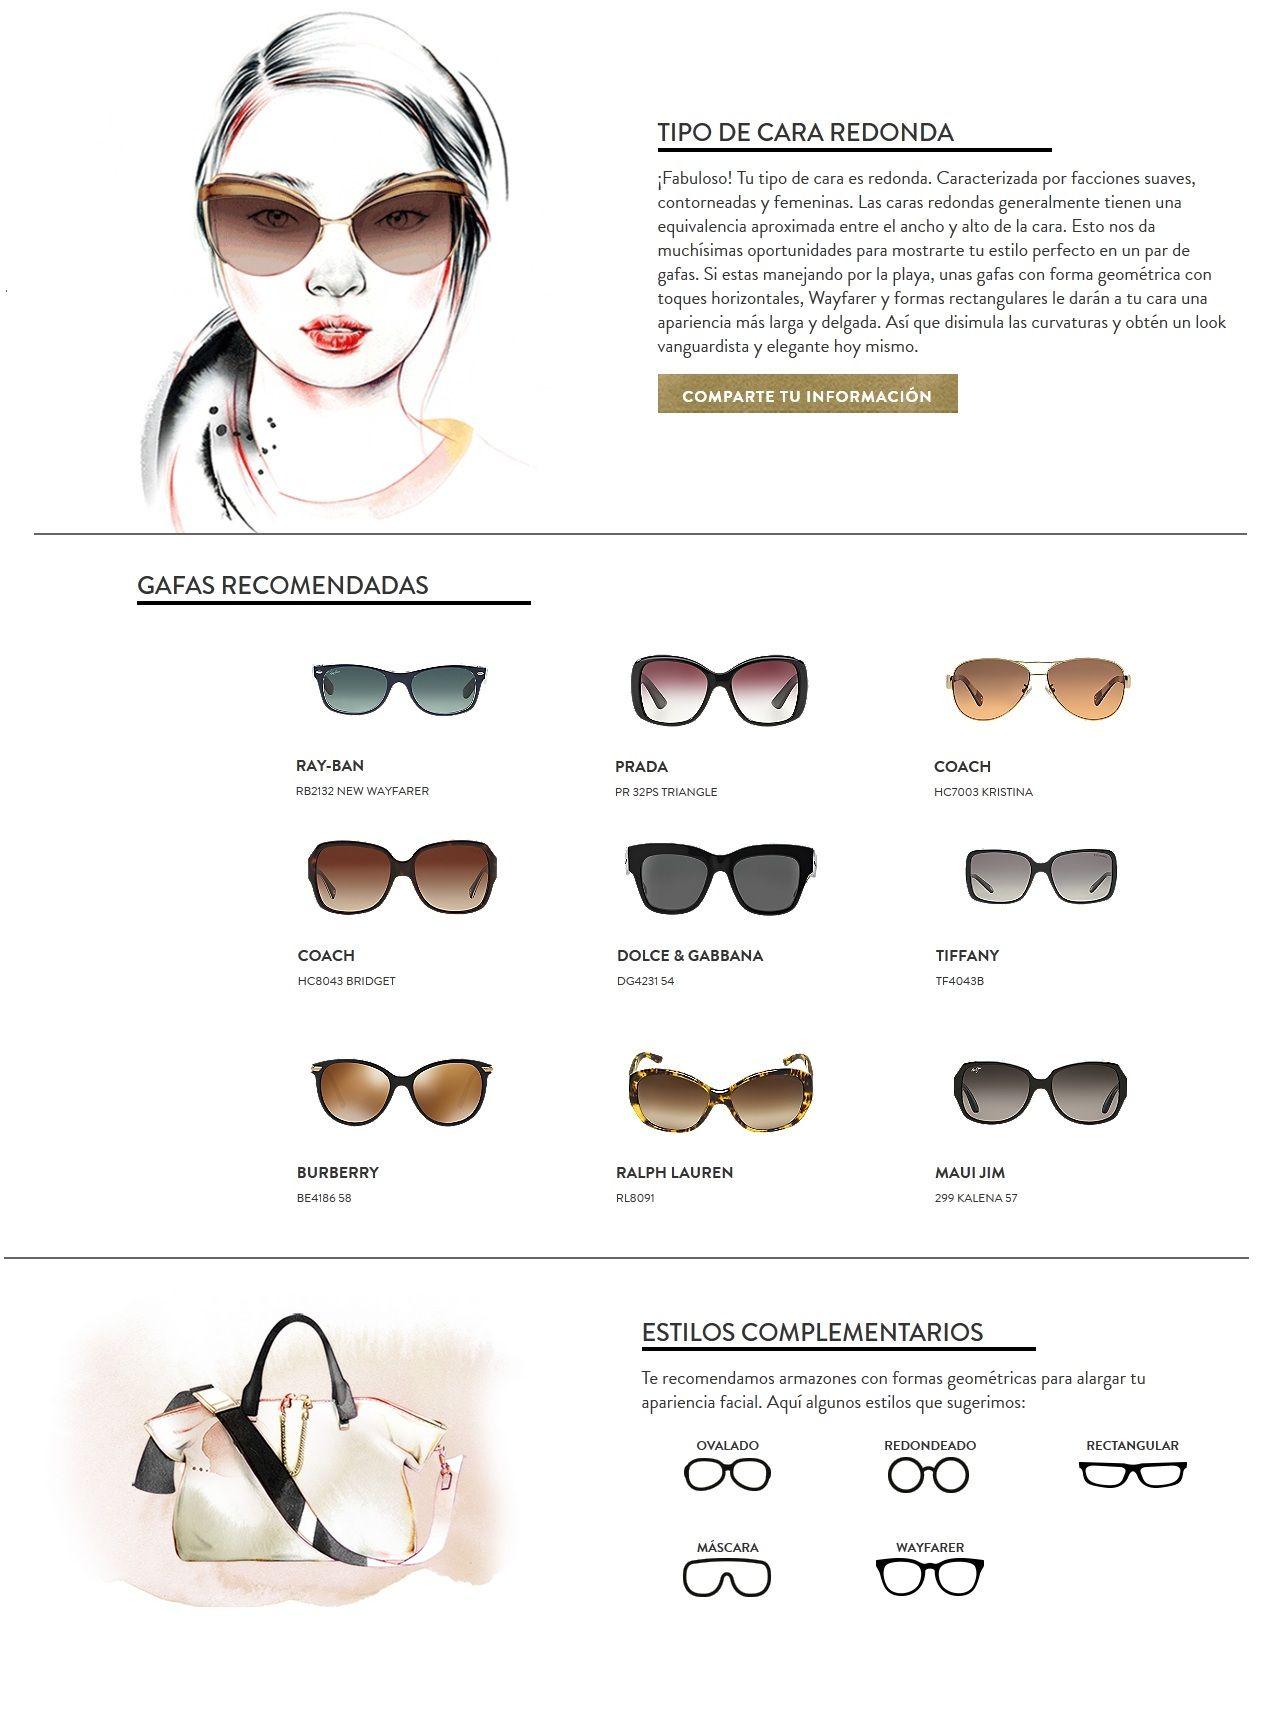 Lentes segun cara redonda, sunglasses | Gafas para cara